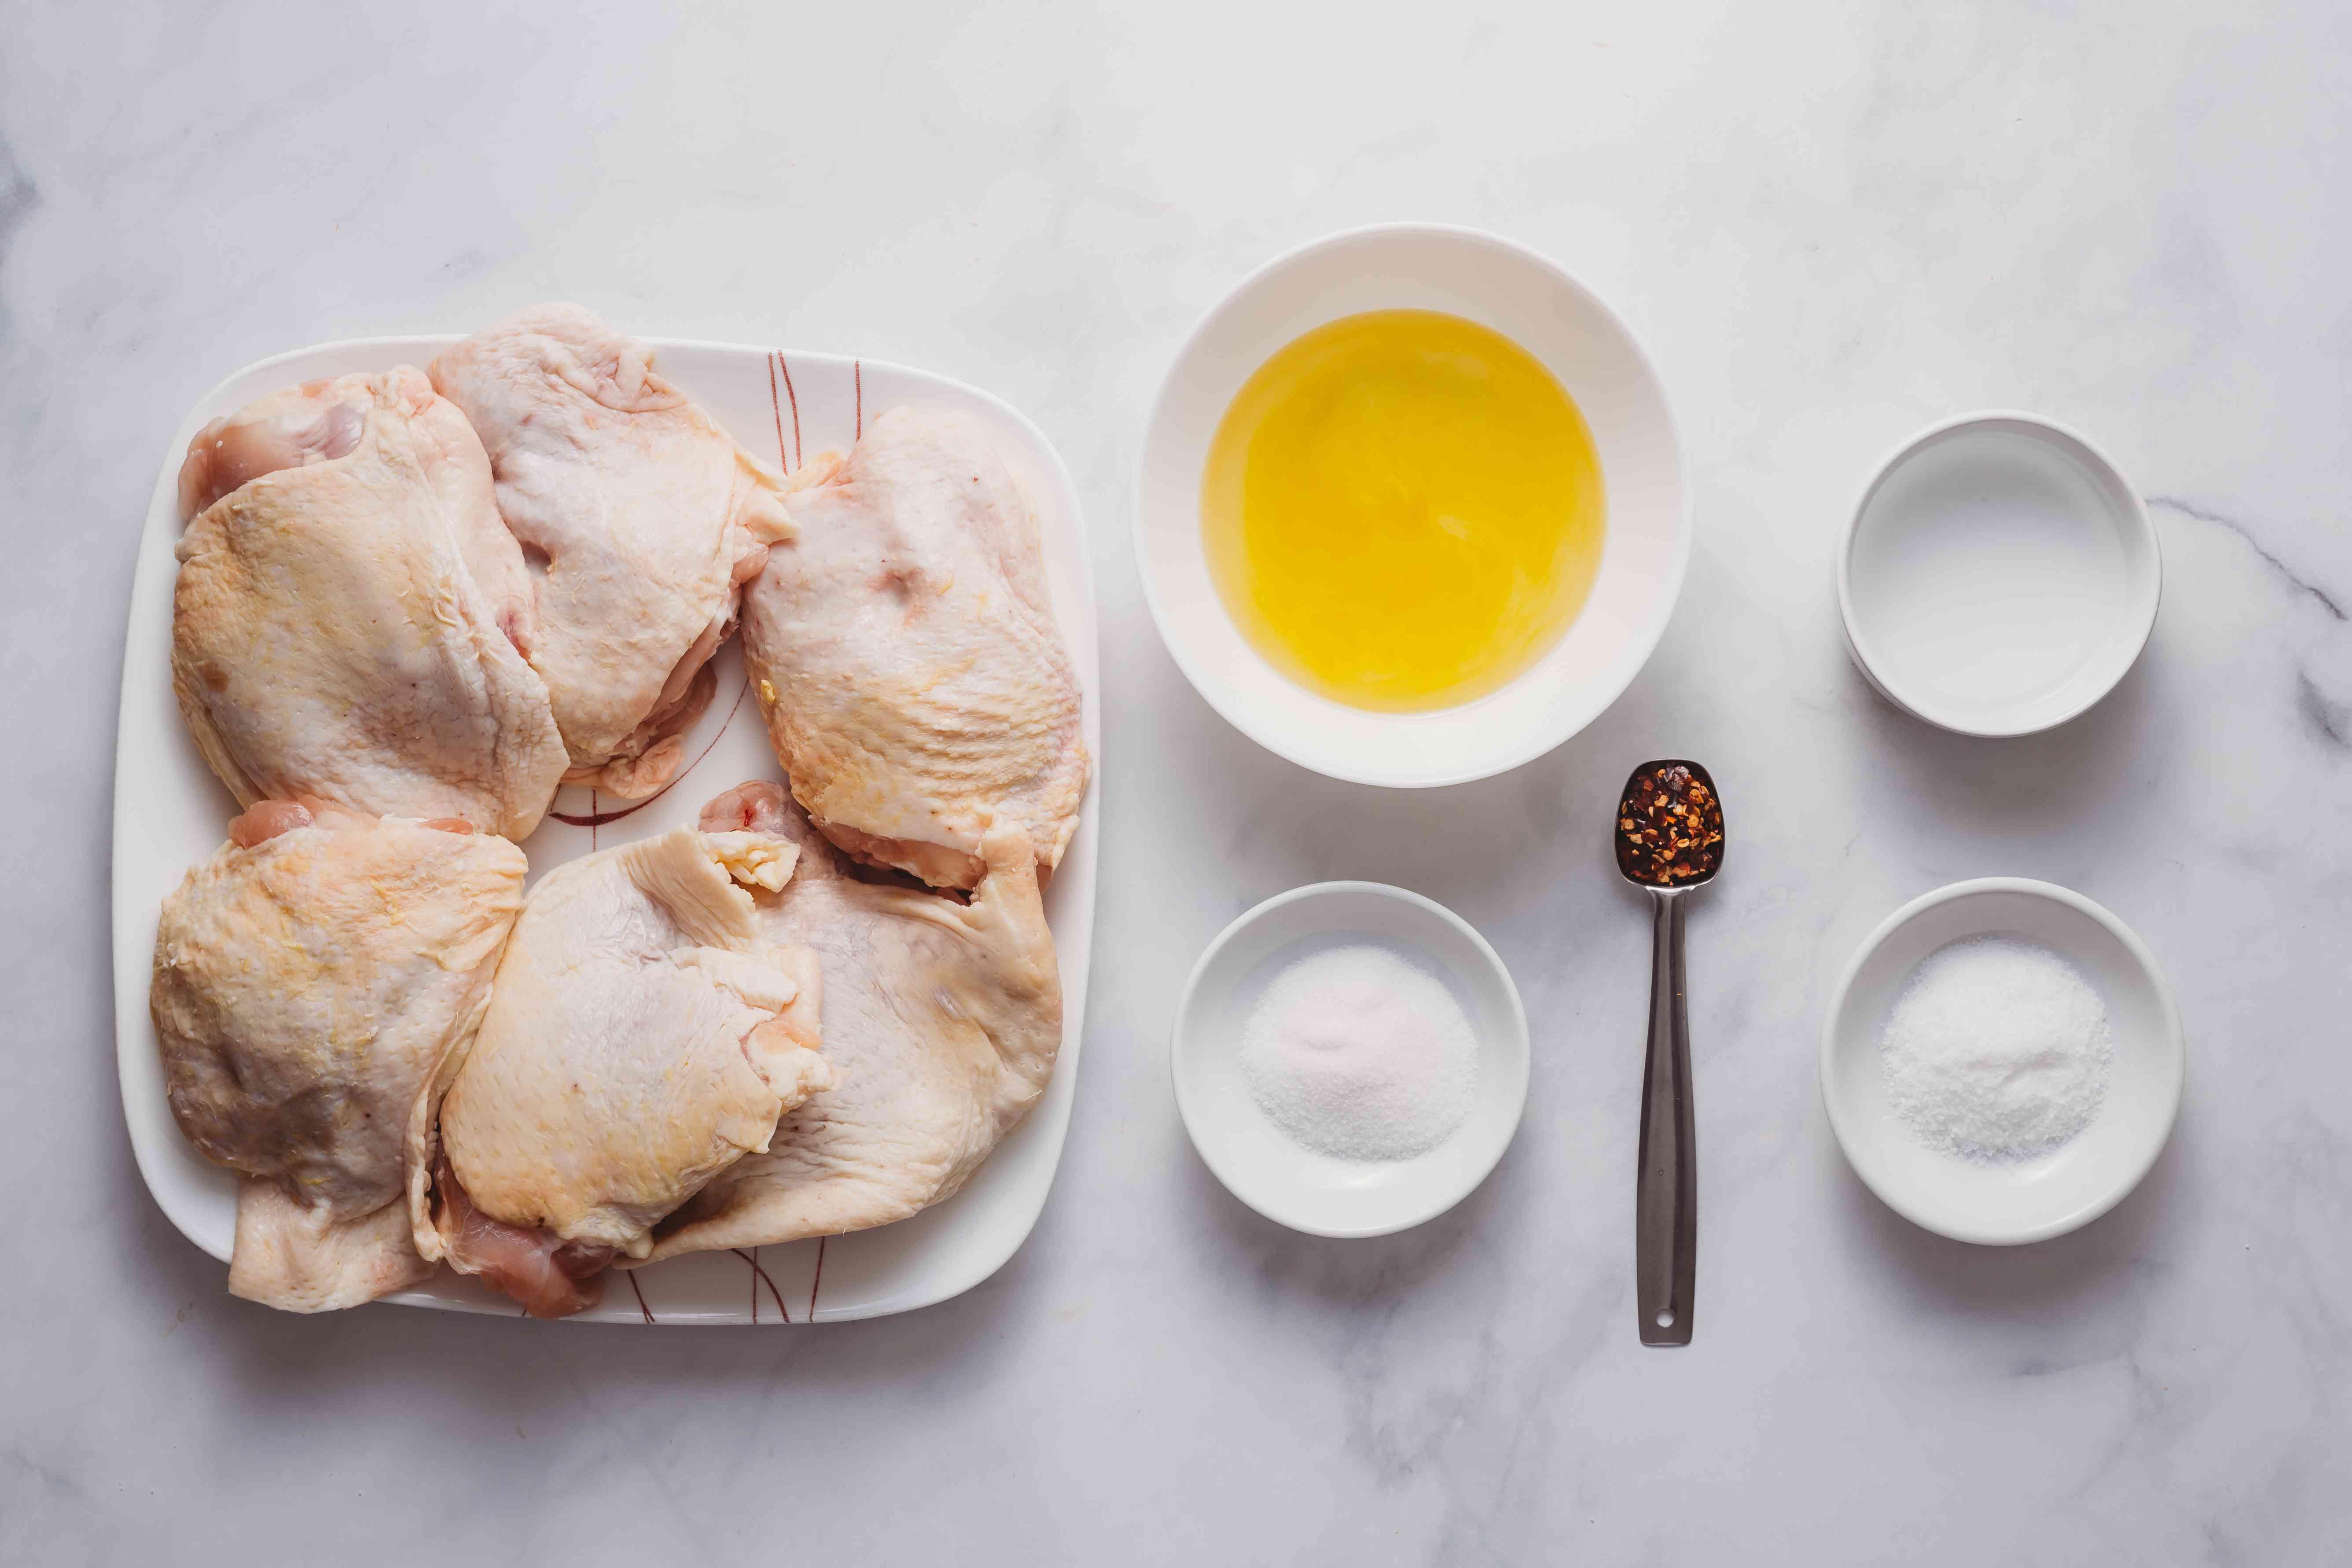 Delicious Grilled BBQ Chicken Thighs ingredients